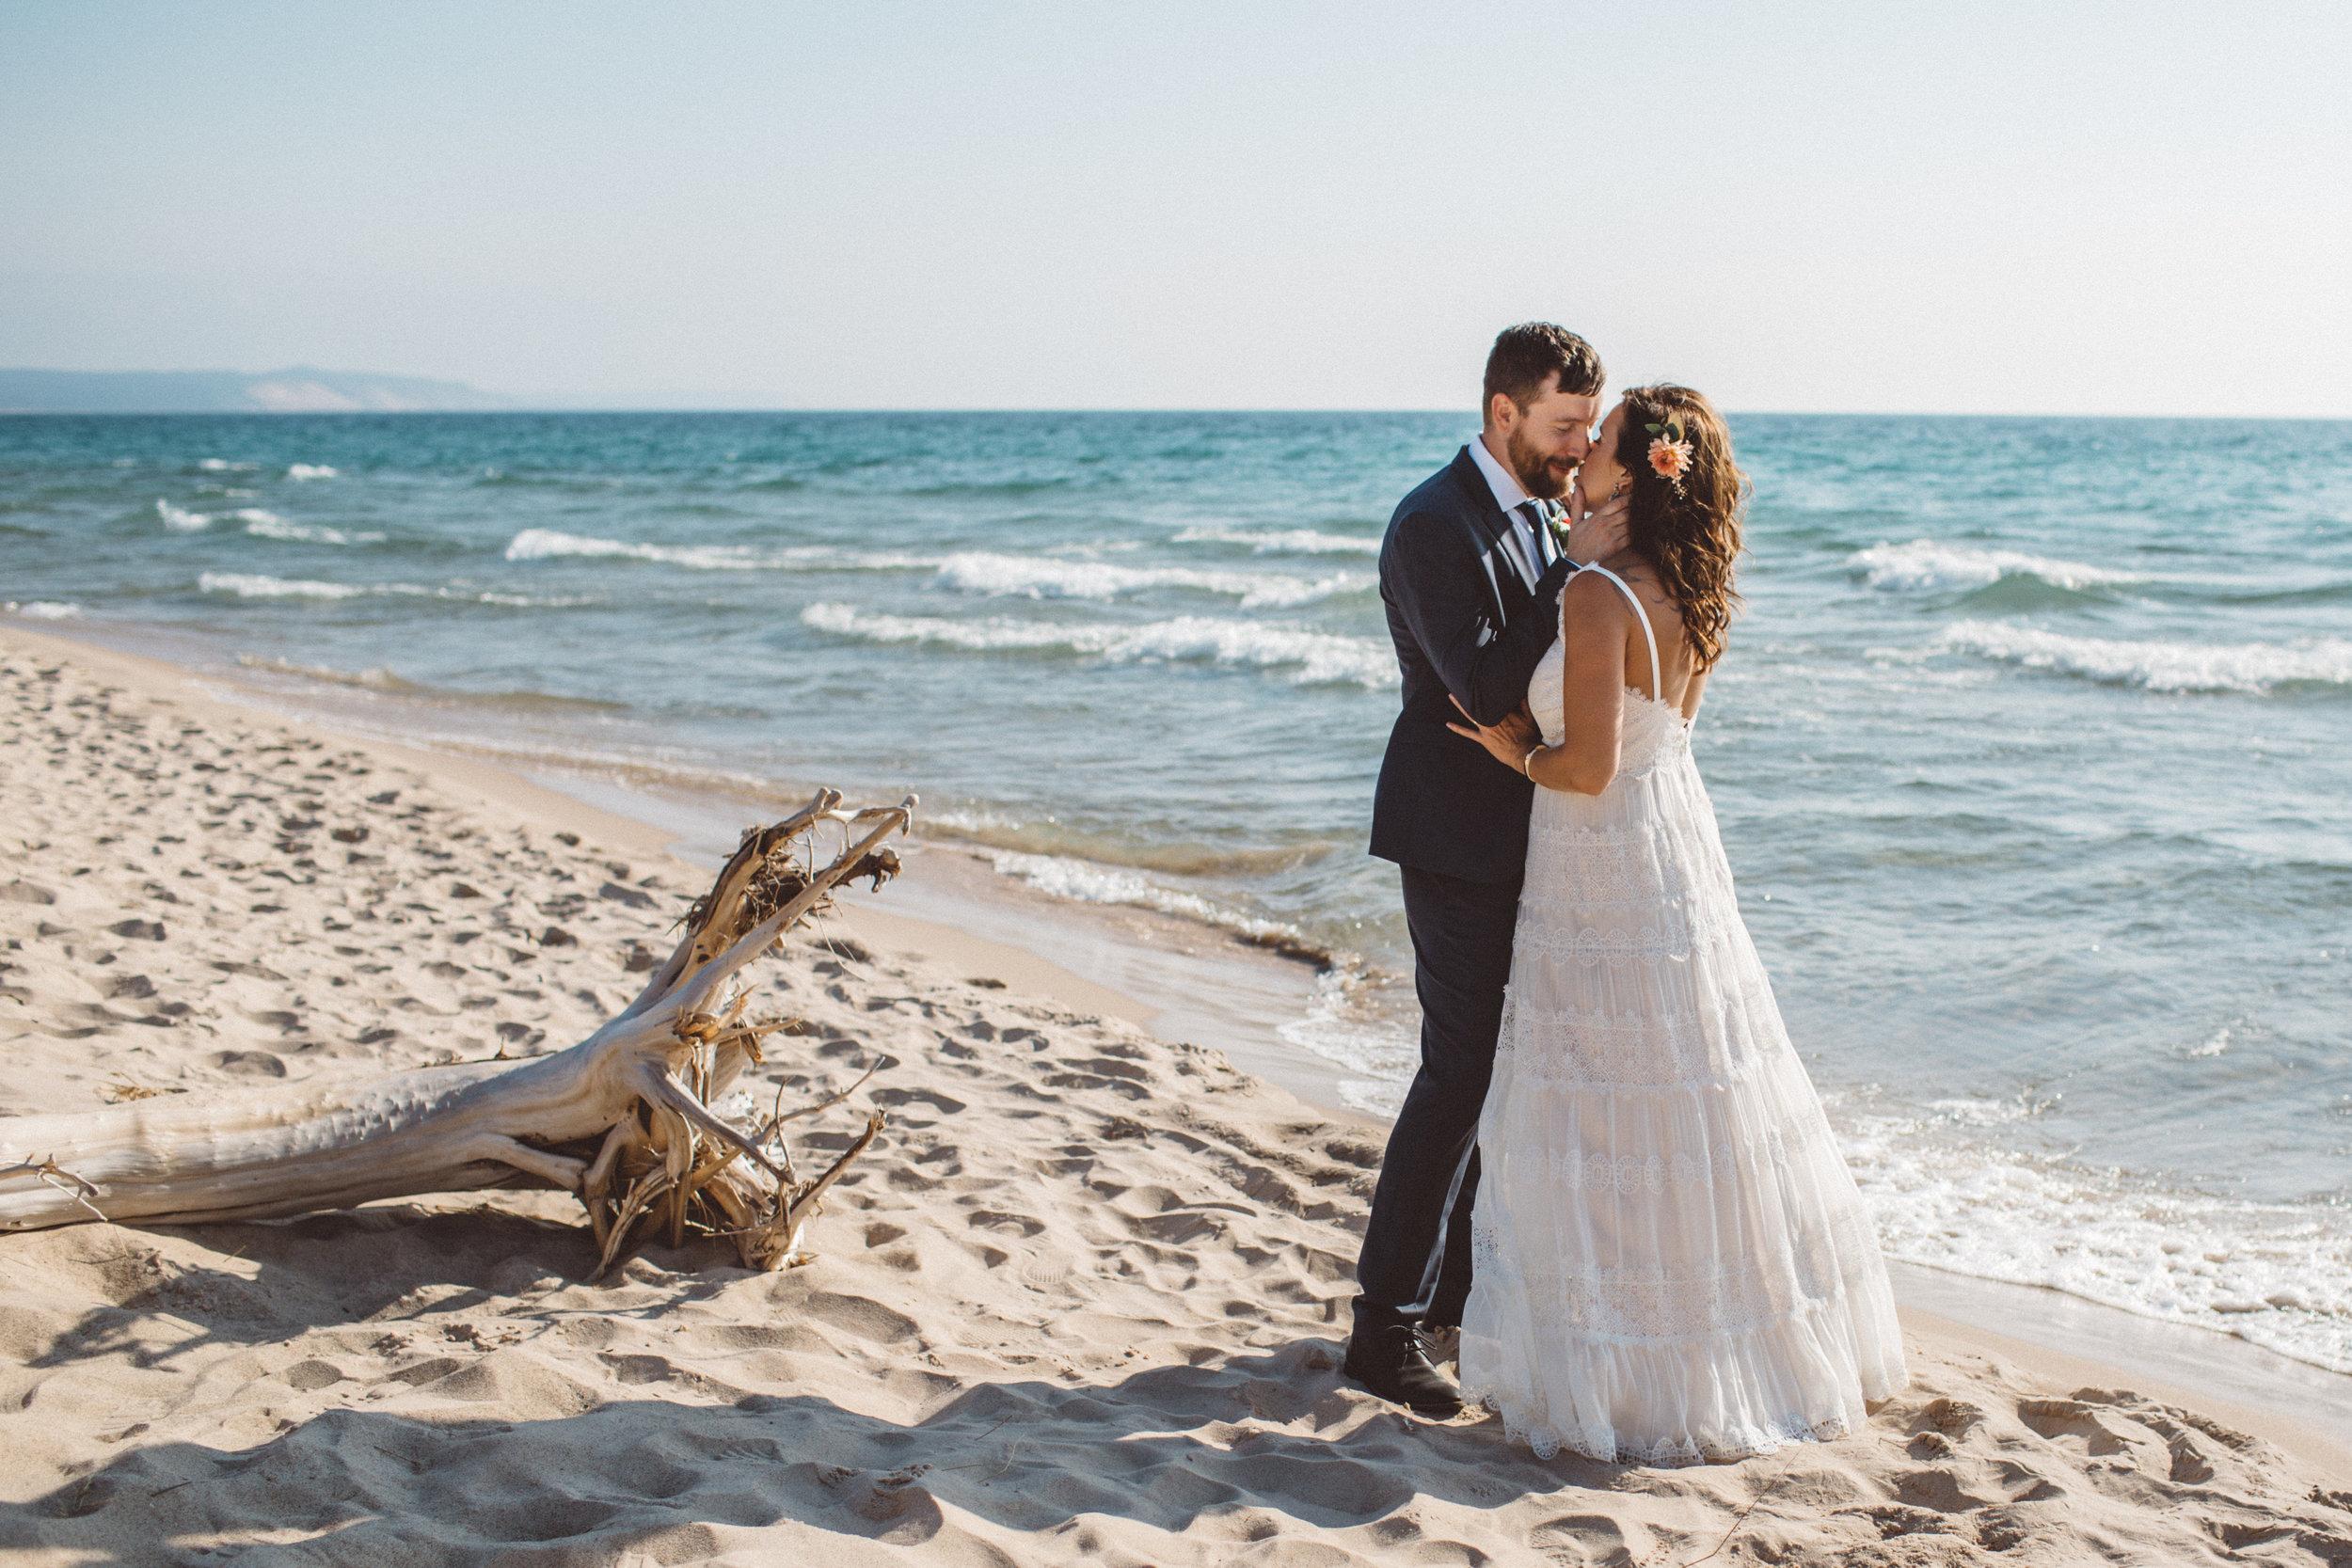 wedding-battle-creek-michigan-photographer-beach-destination-kalamazoo